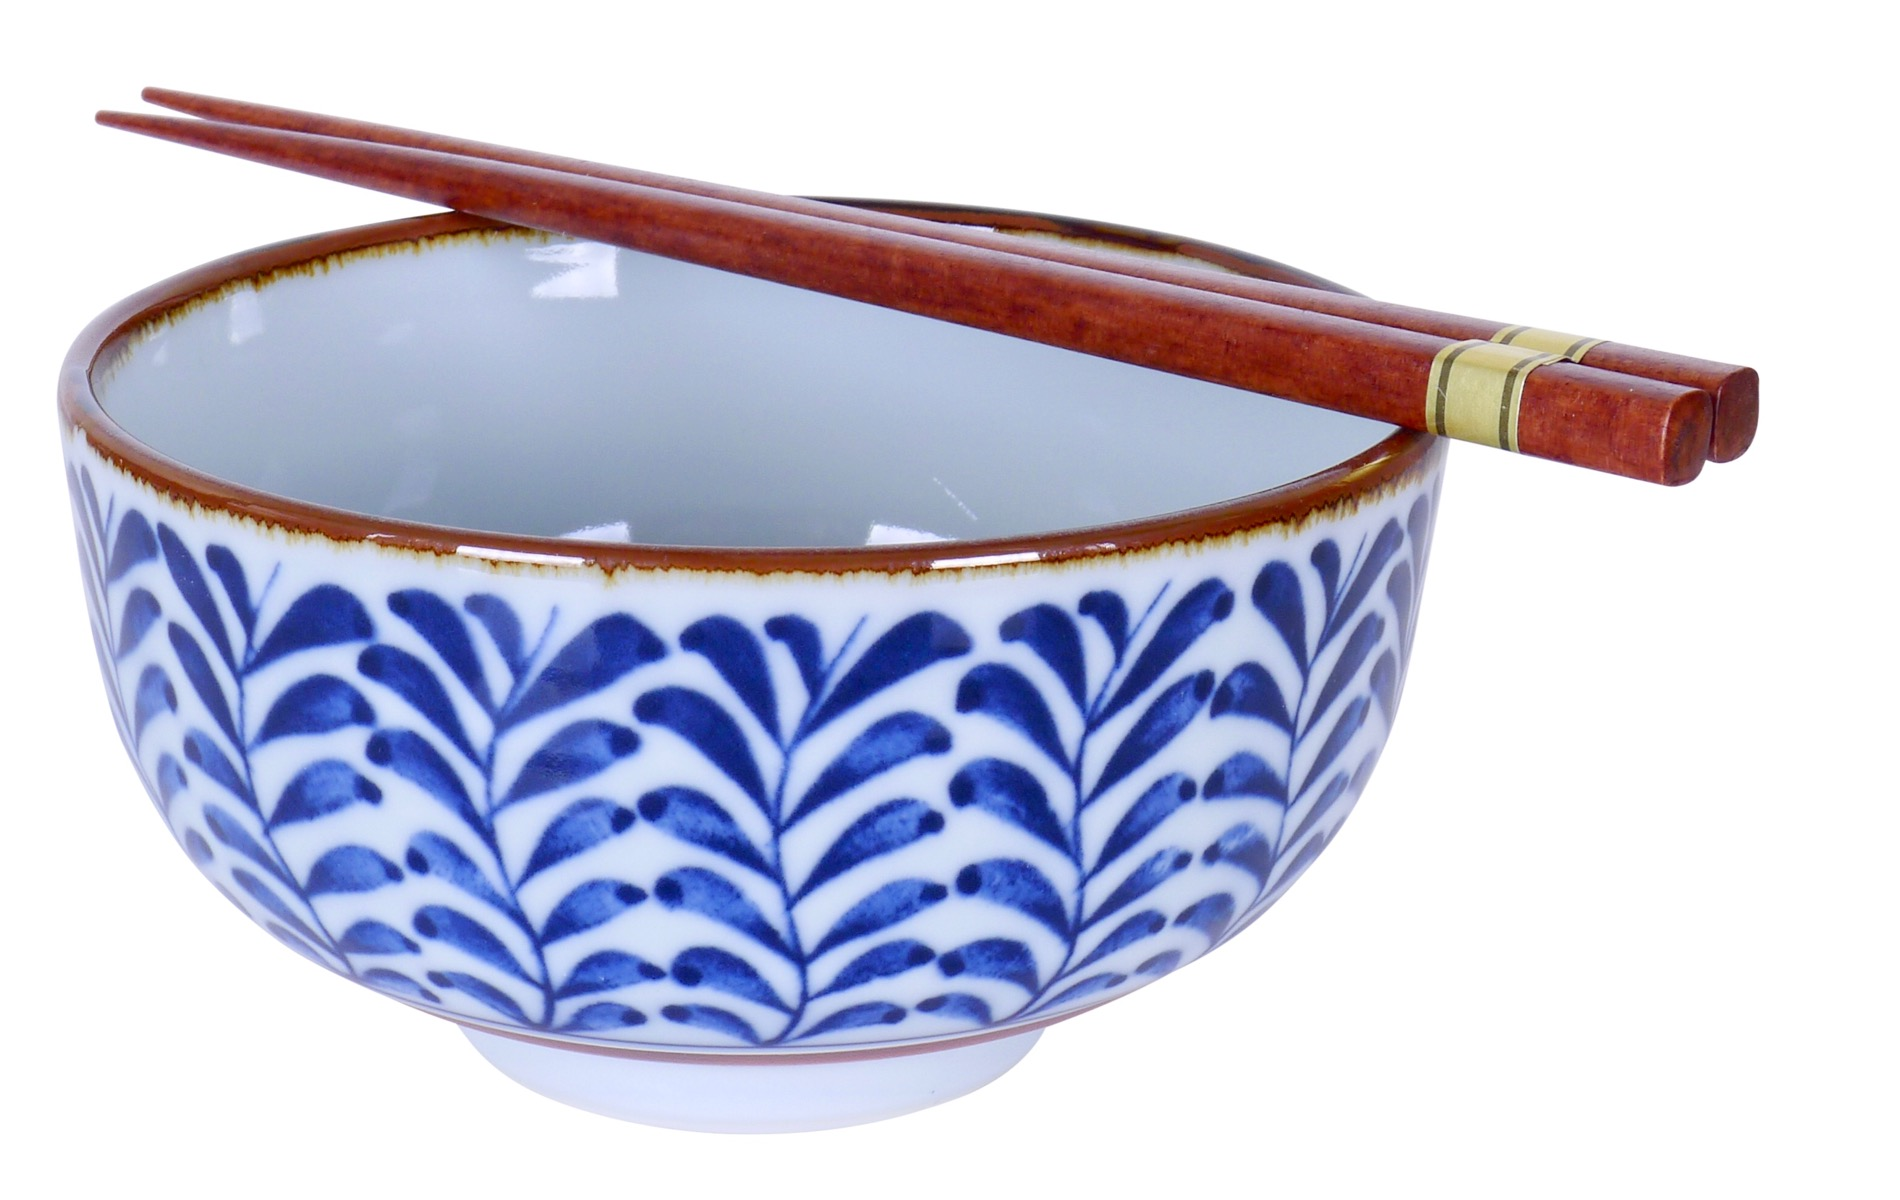 Image of White Porcelain Bowl with Blue Leaf Design, 5.5x3.25 Inch